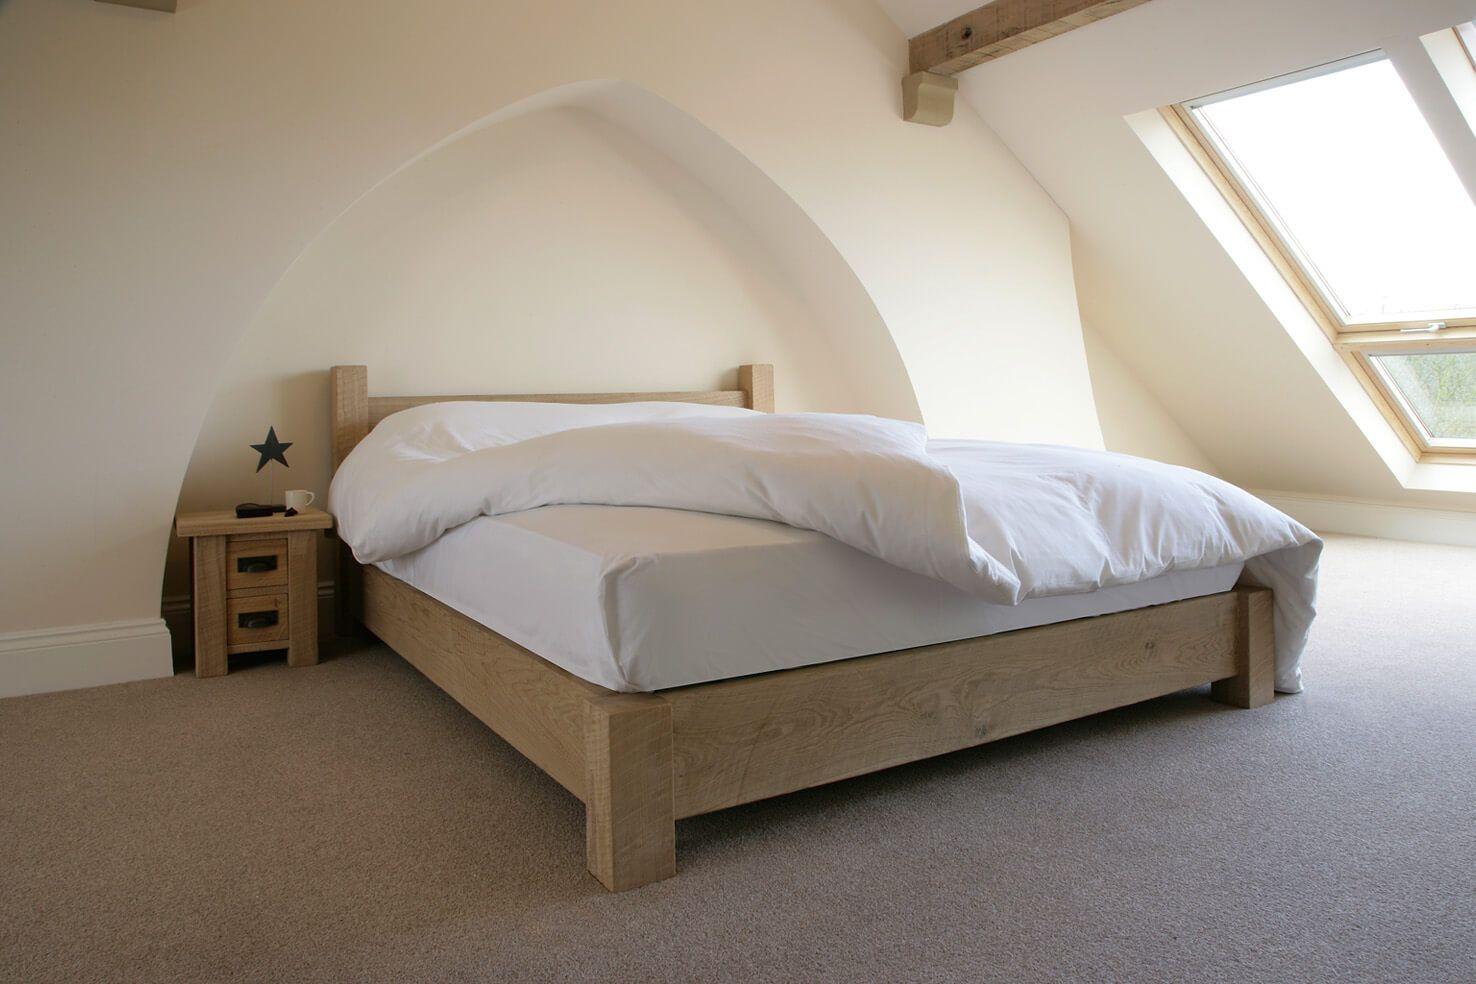 The Crofter S Oak Bed No Footend Oak Beds Oak Bedroom Furniture Bed Slats